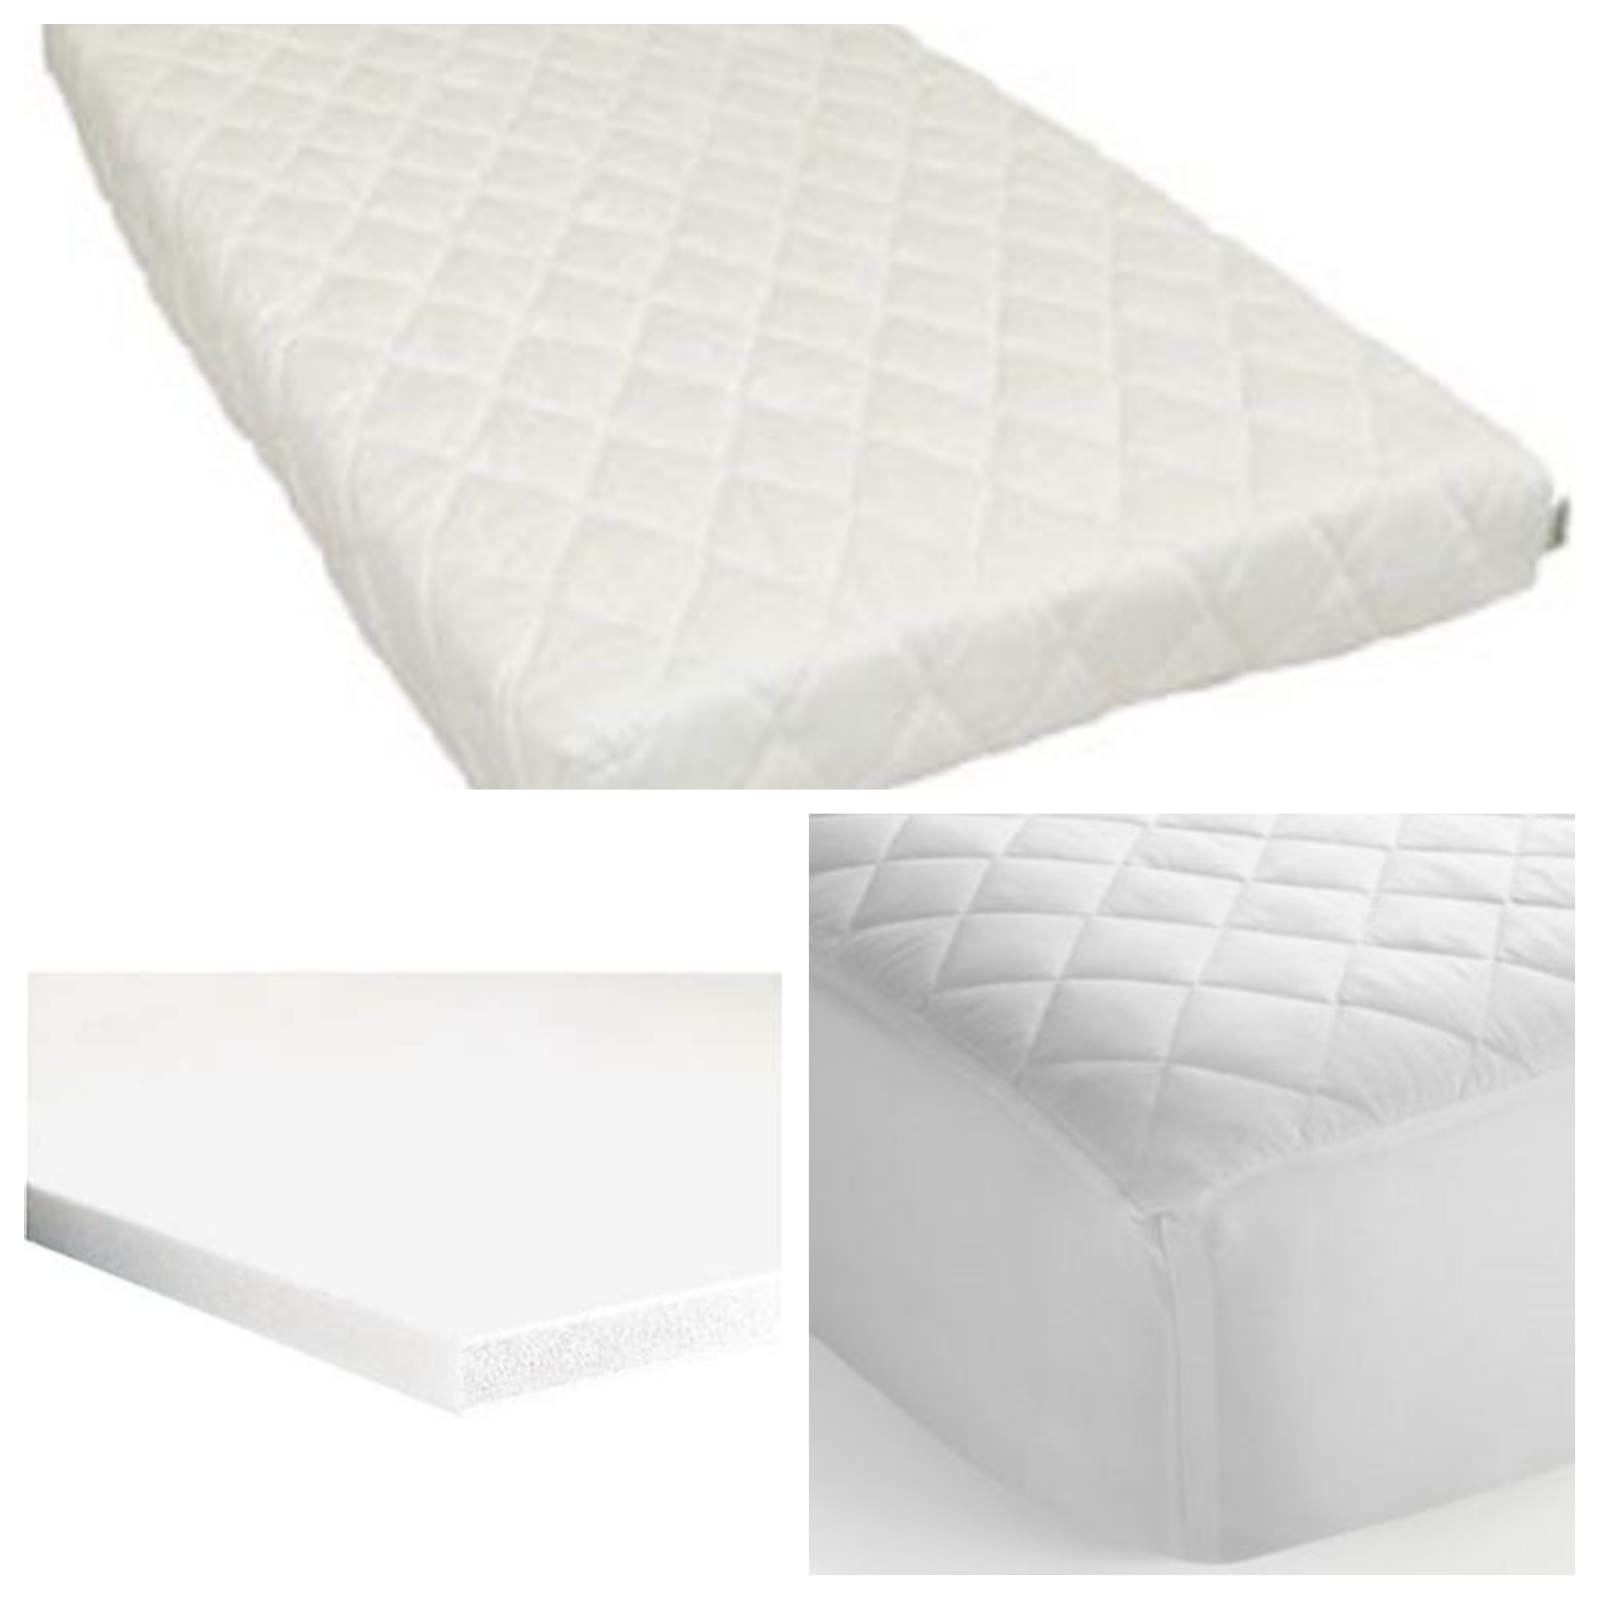 Crib Mattress 90x40x5 / 89x38x5 Extra Thick Cushy Comfy Made in England A+Grade 2